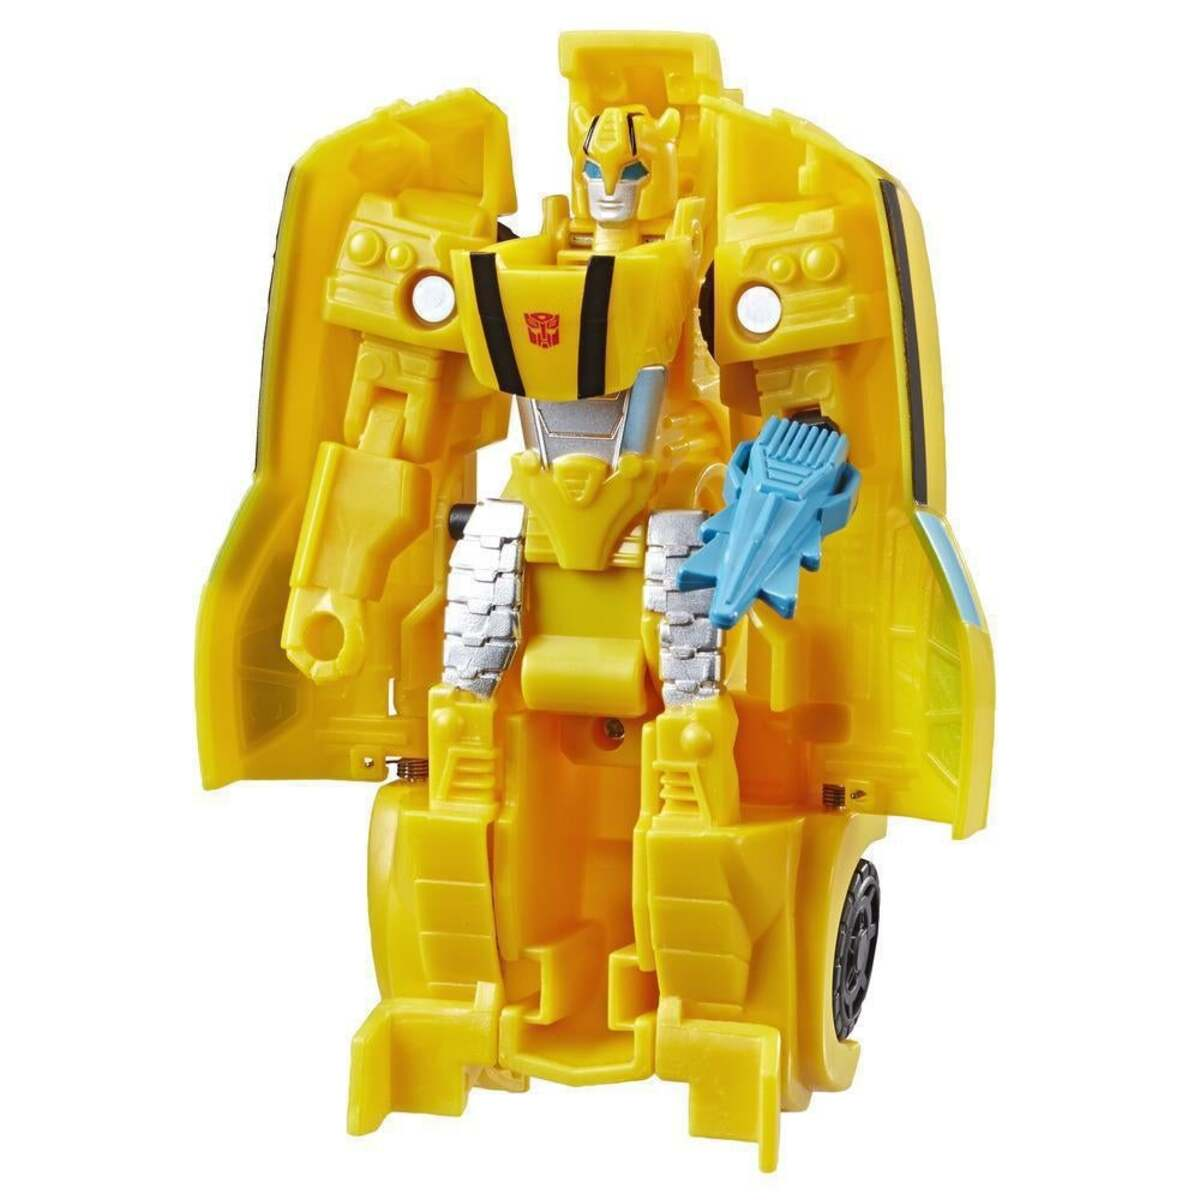 Bild 4 von Hasbro Transformers Cyberverse Action Attackers: 1-Step